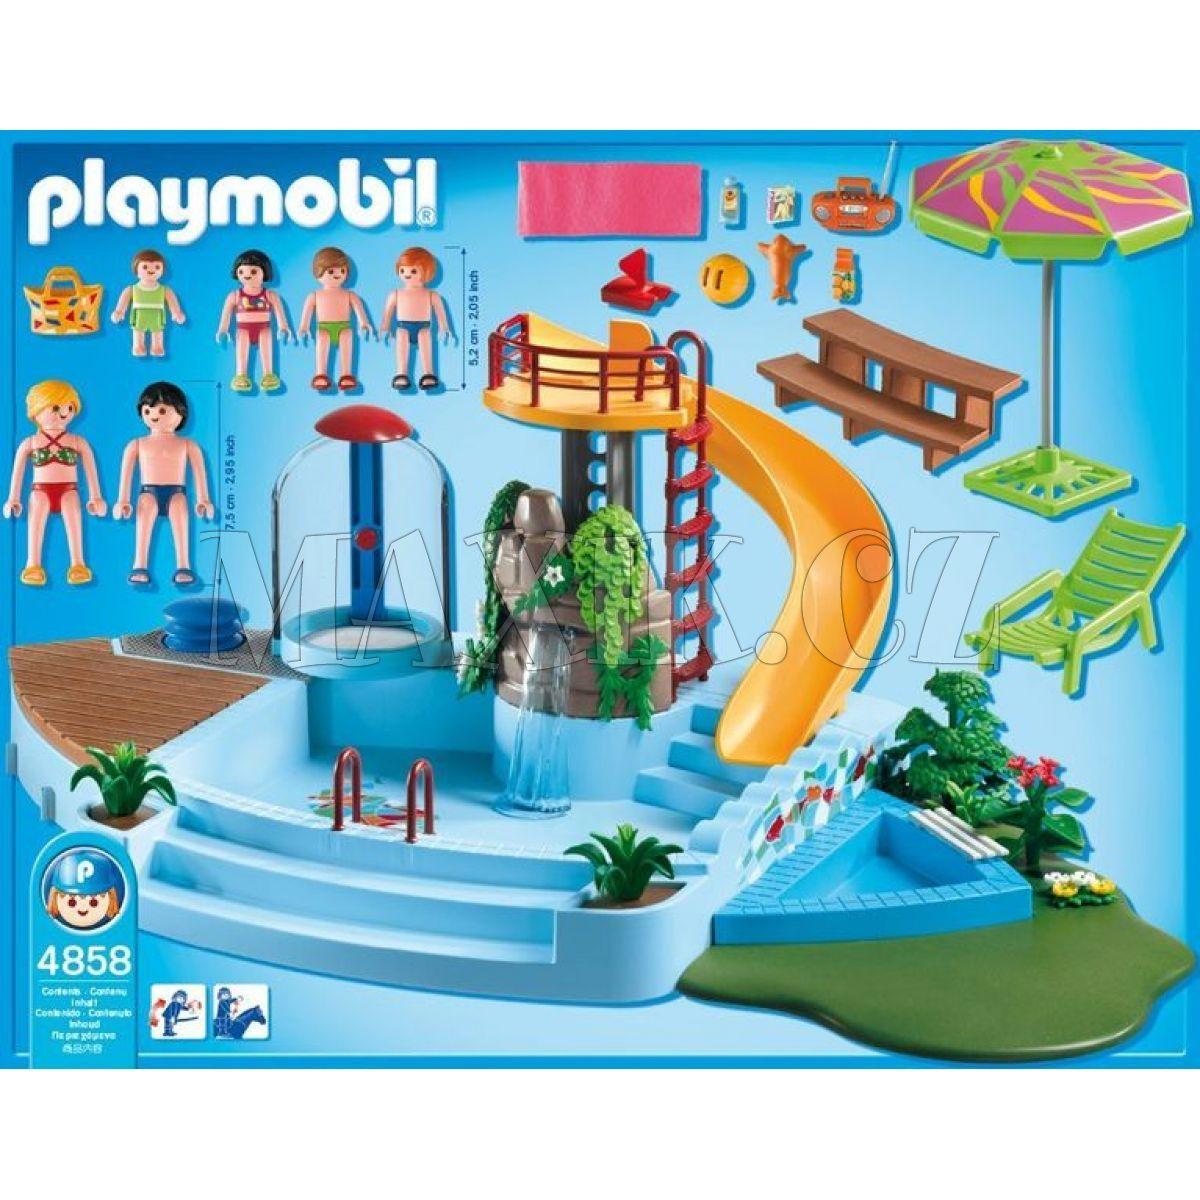 Playmobil 4858 baz n se skluzavkou max kovy hra ky for Playmobil 4858 piscine avec toboggan